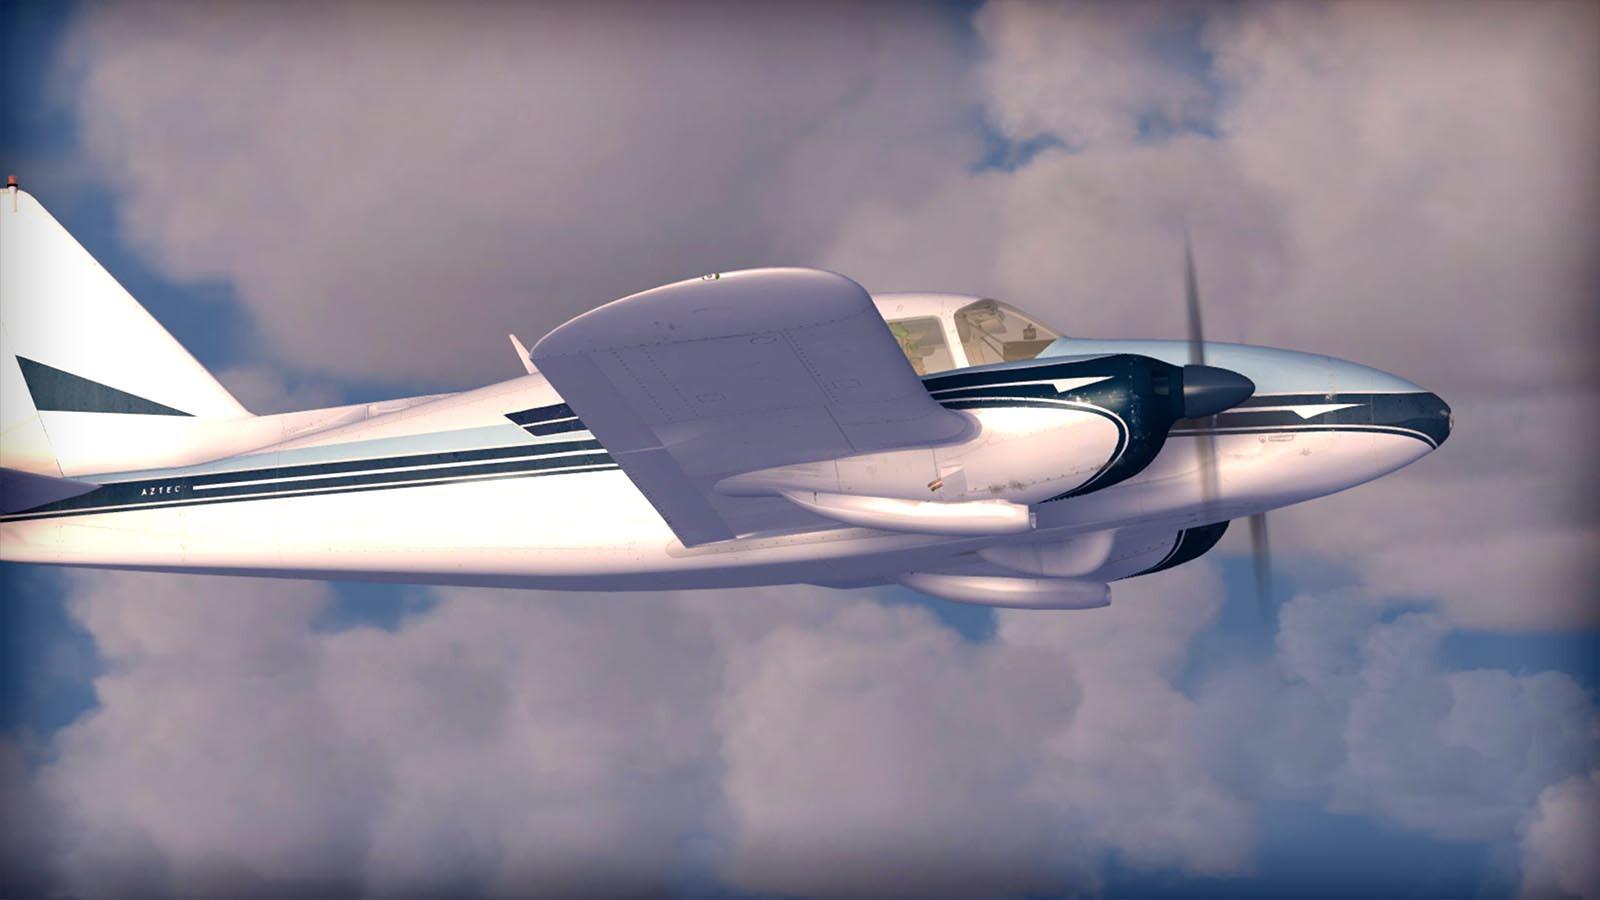 Microsoft Flight Simulator X: Steam Edition - Piper Aztec Add-On [Steam CD  Key] for PC - Buy now